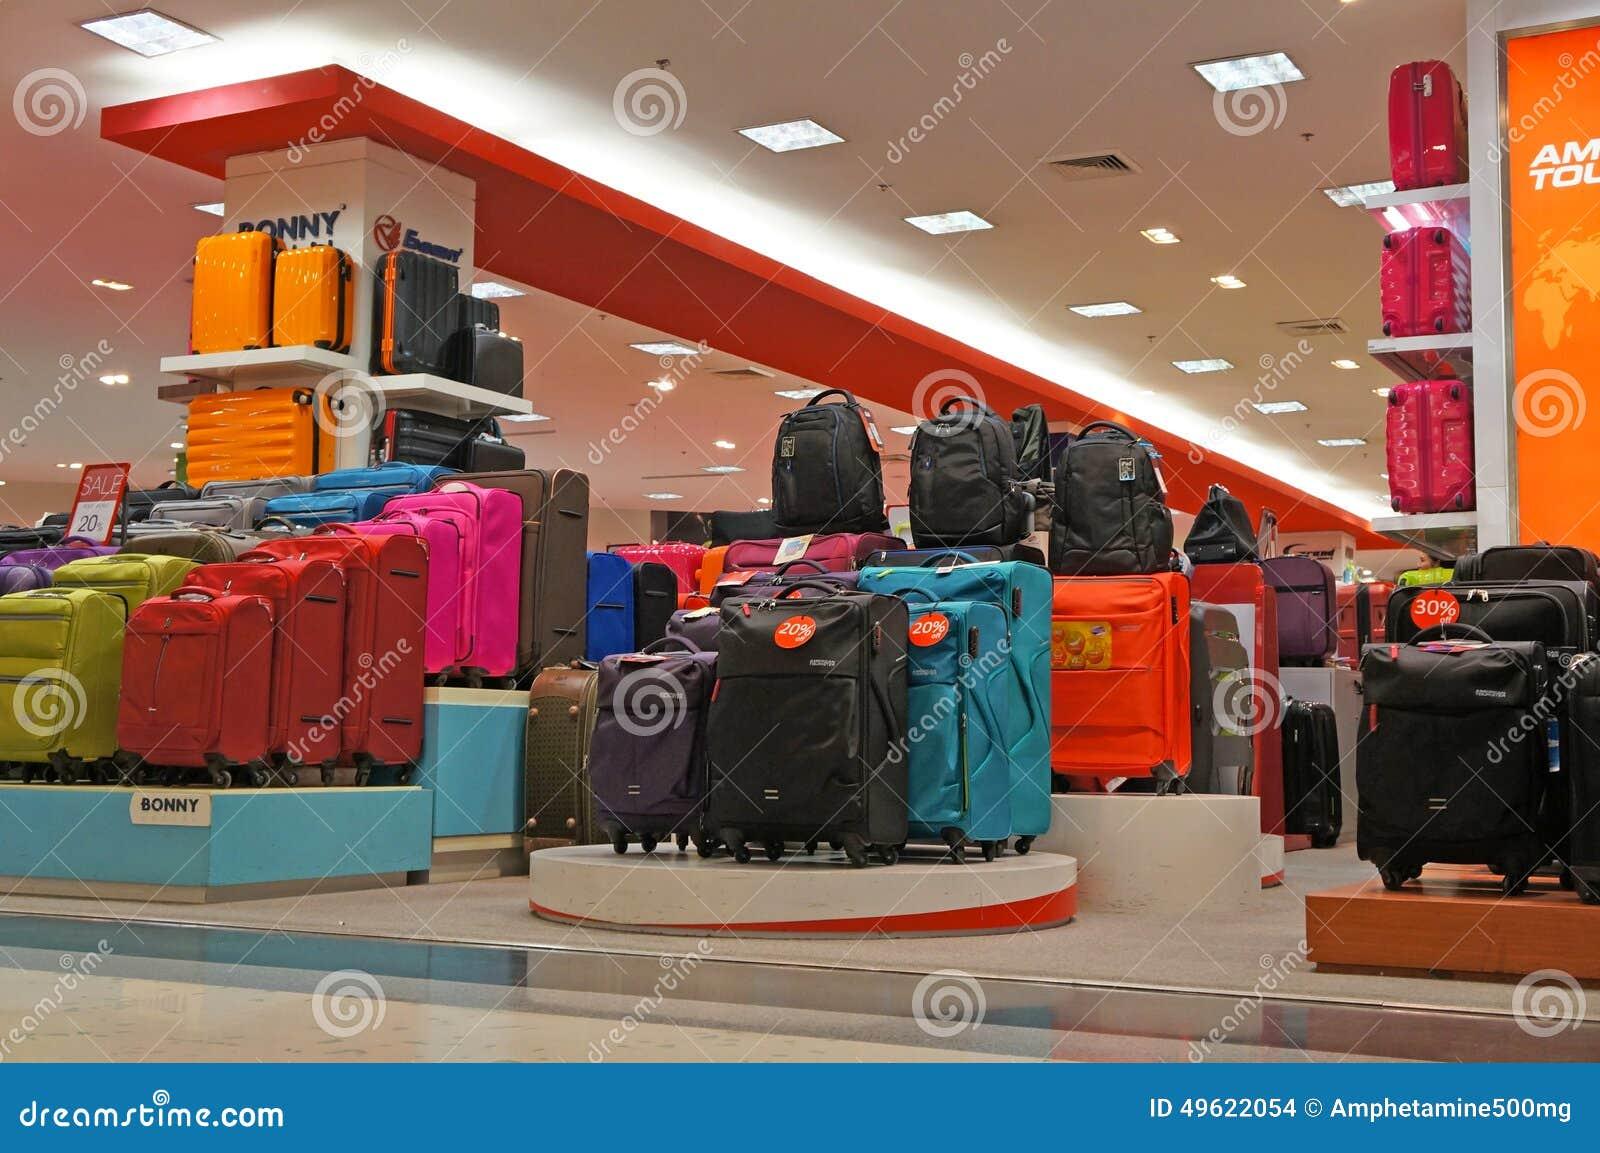 Luggage Editorial Stock Photo - Image: 49455018